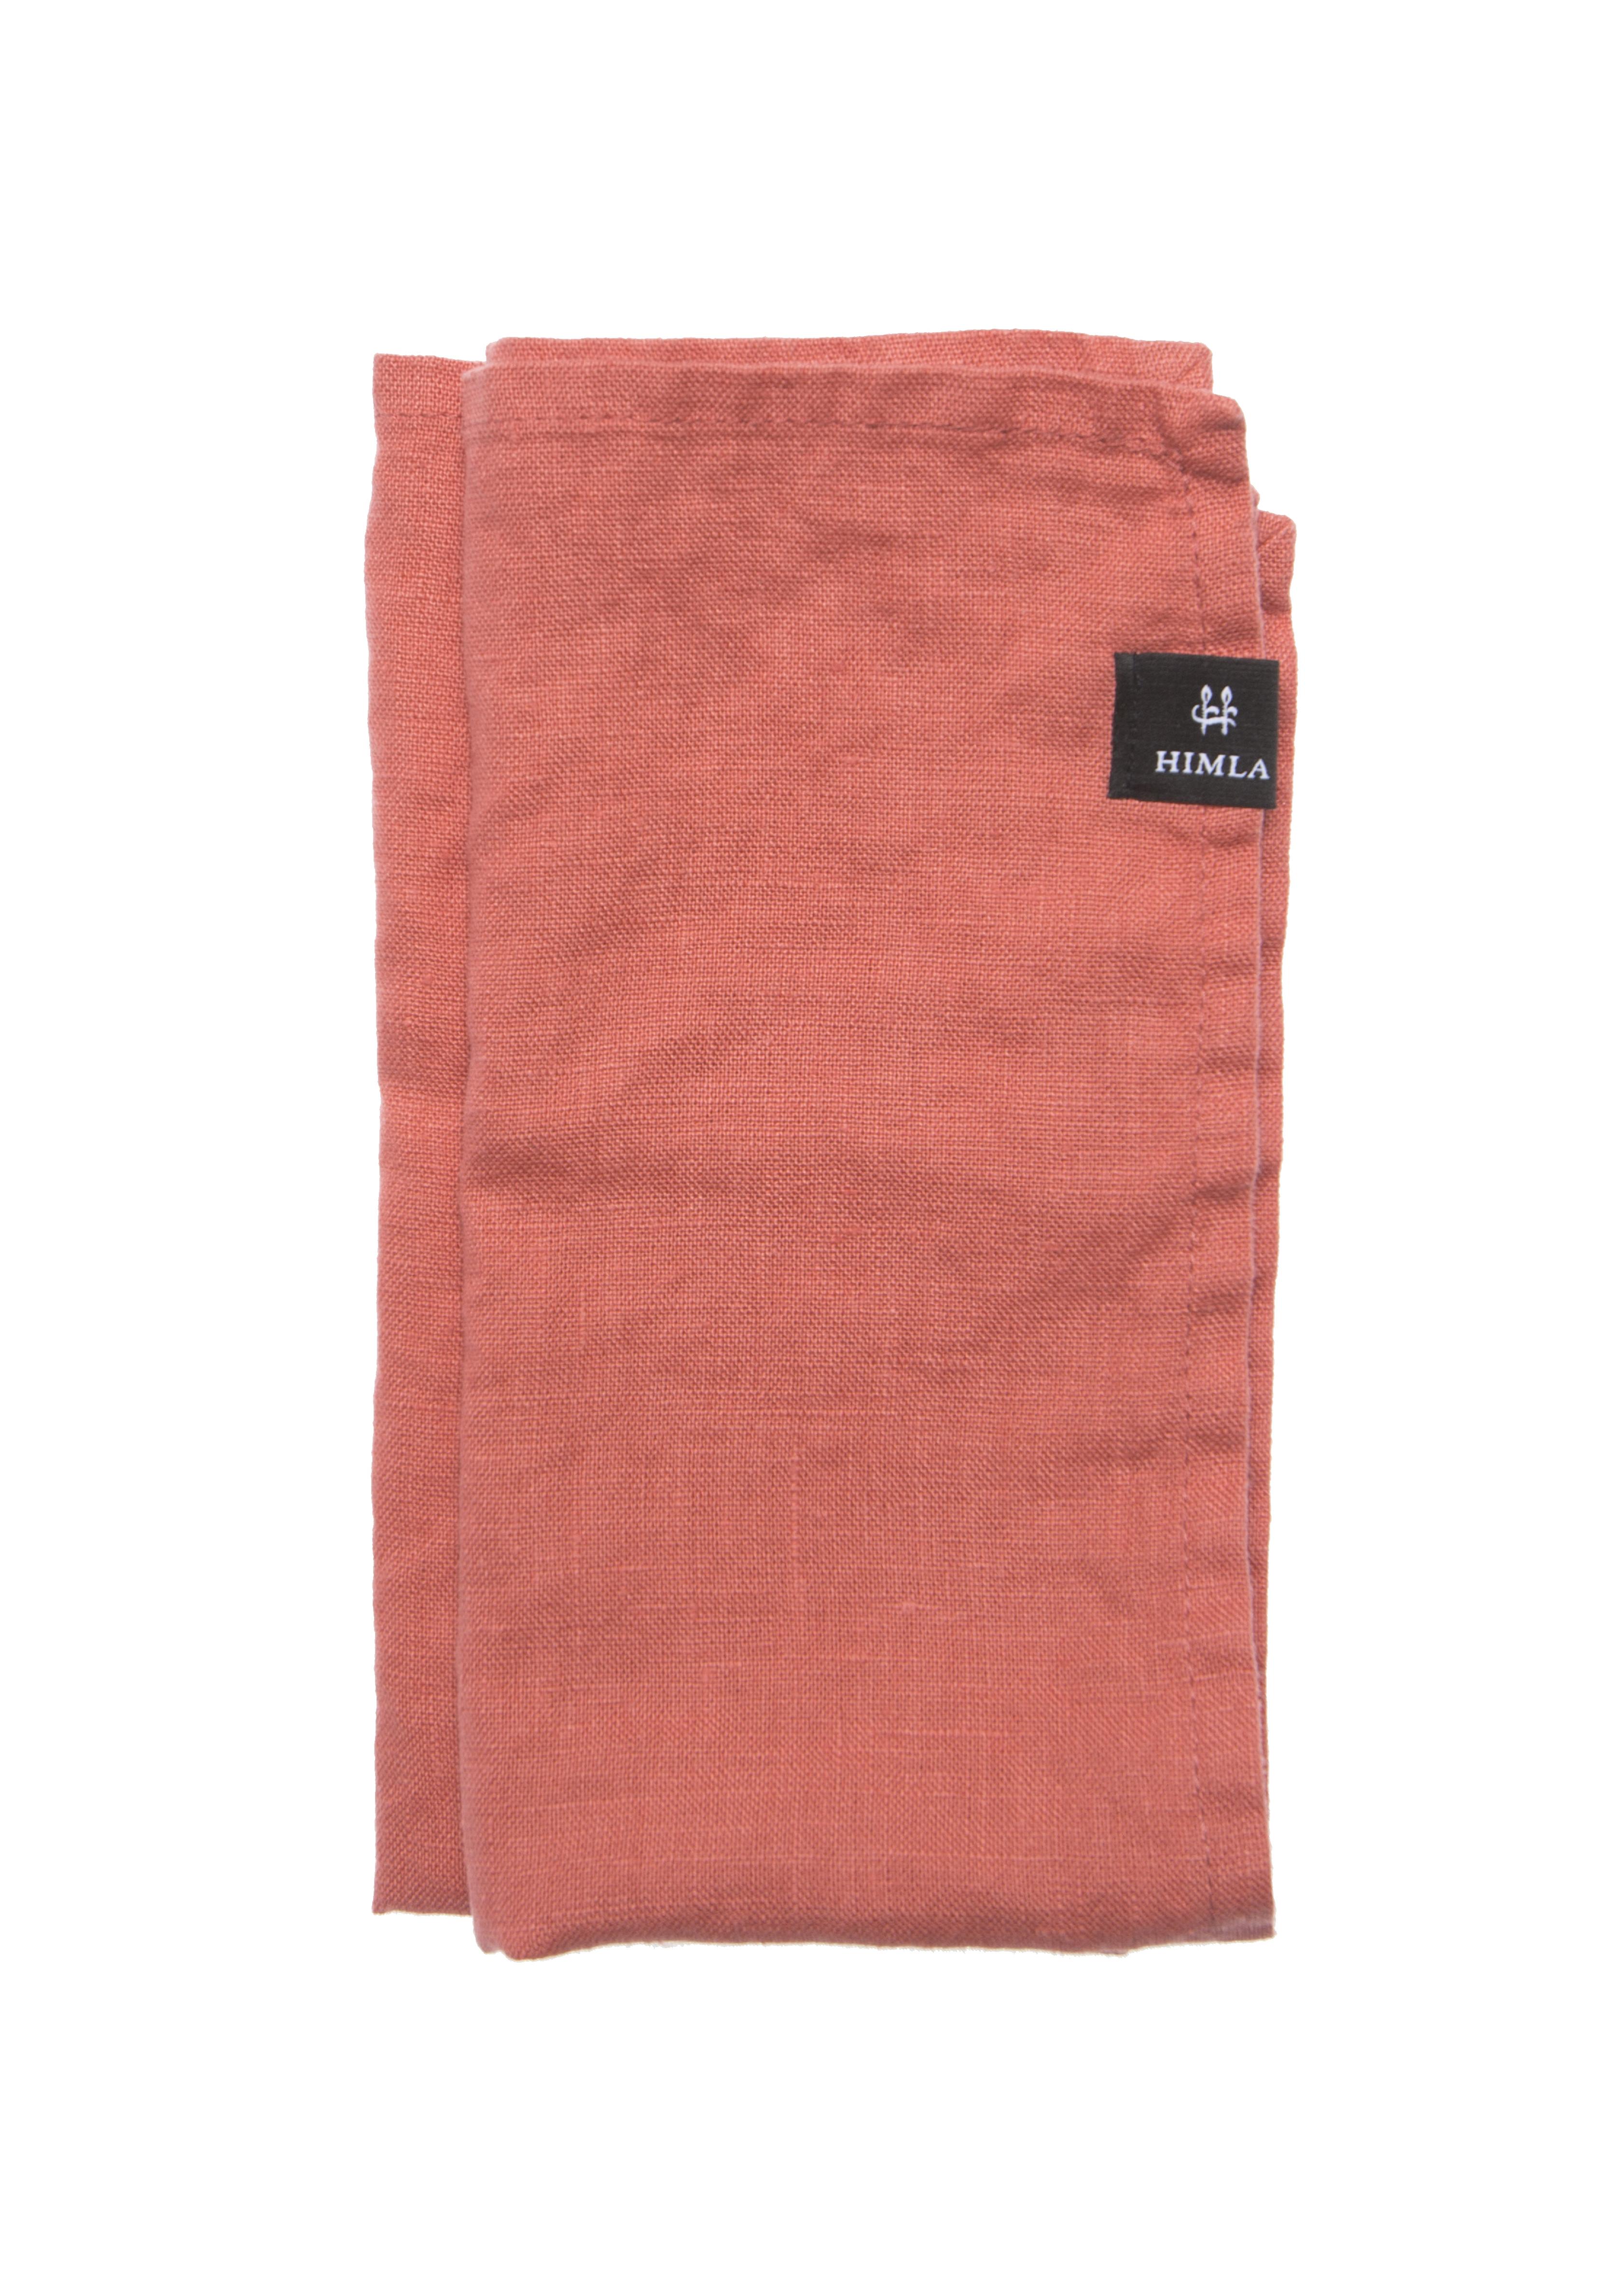 Rouge Sunshine Linen Napkin 45x45cm (Set of 4)